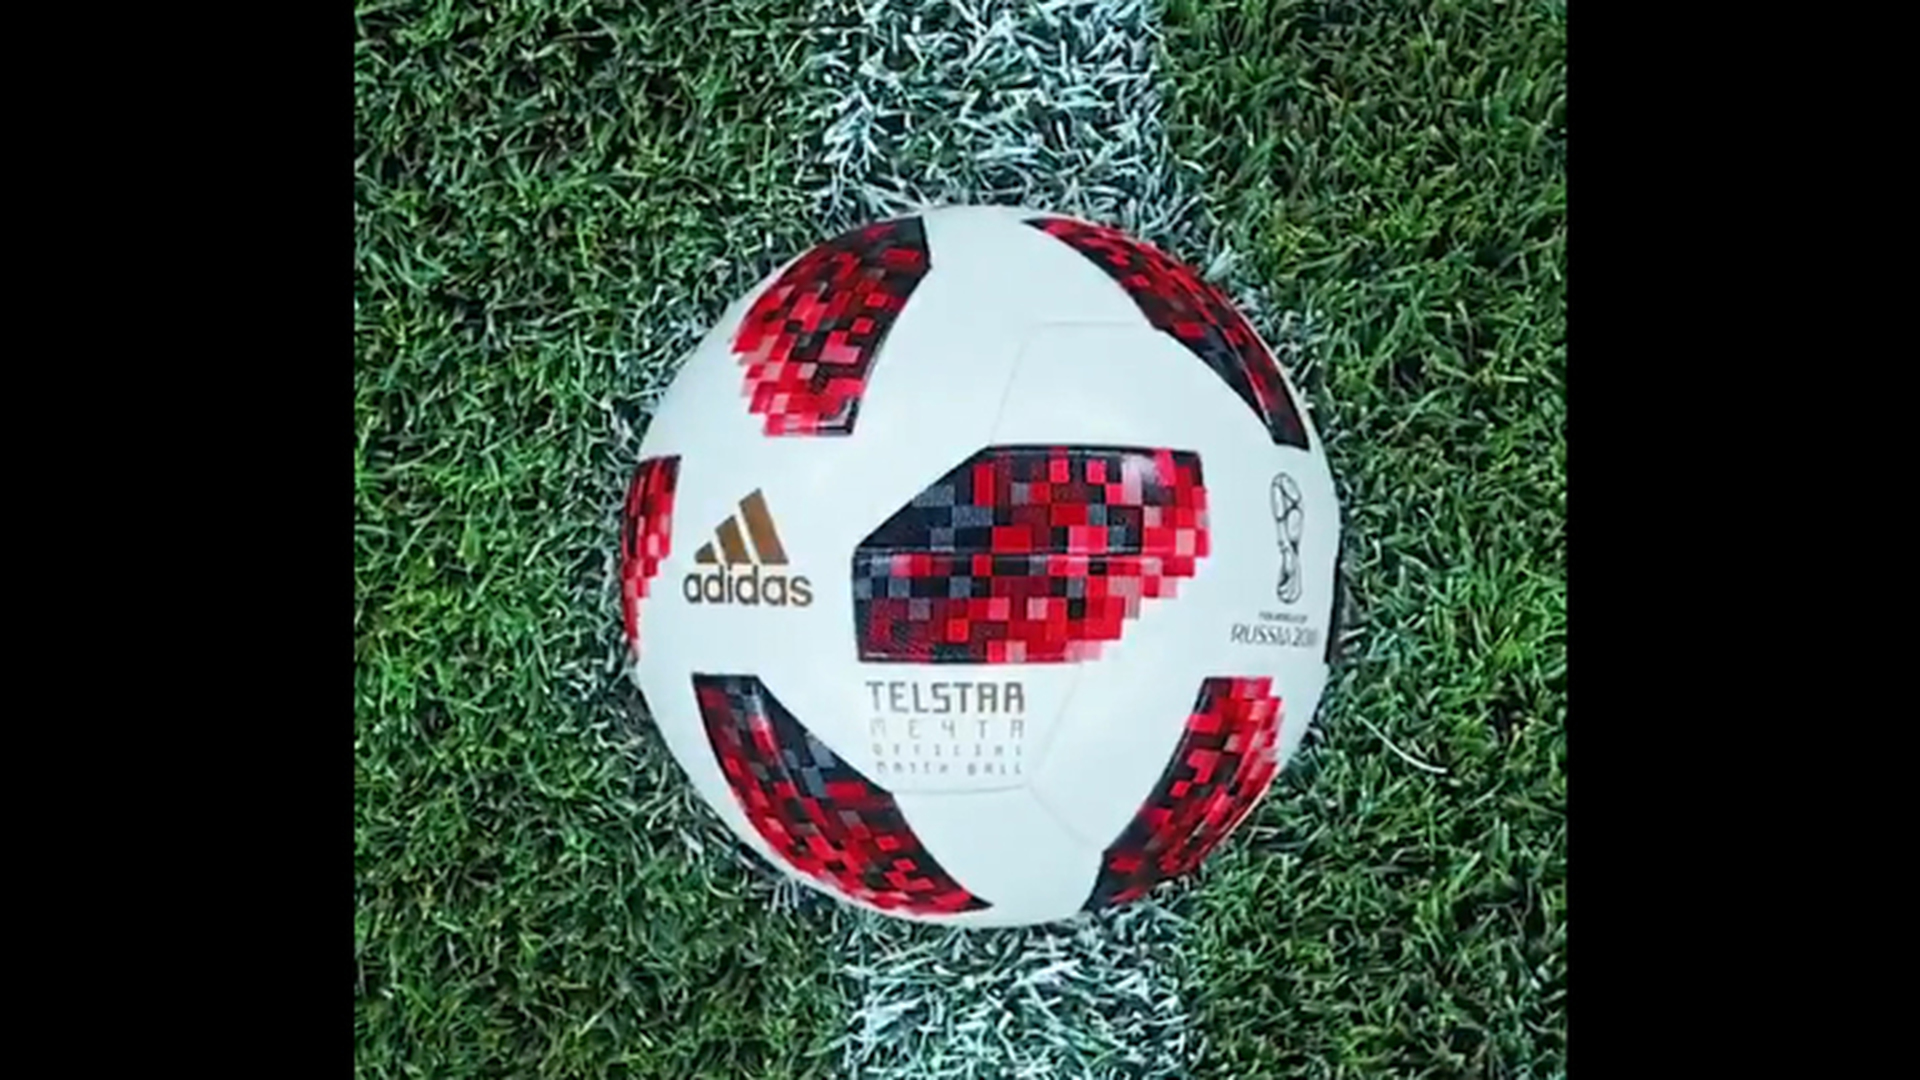 Представлен официальный мяч чемпионата мира по футболу 2018 ... | 1080x1920